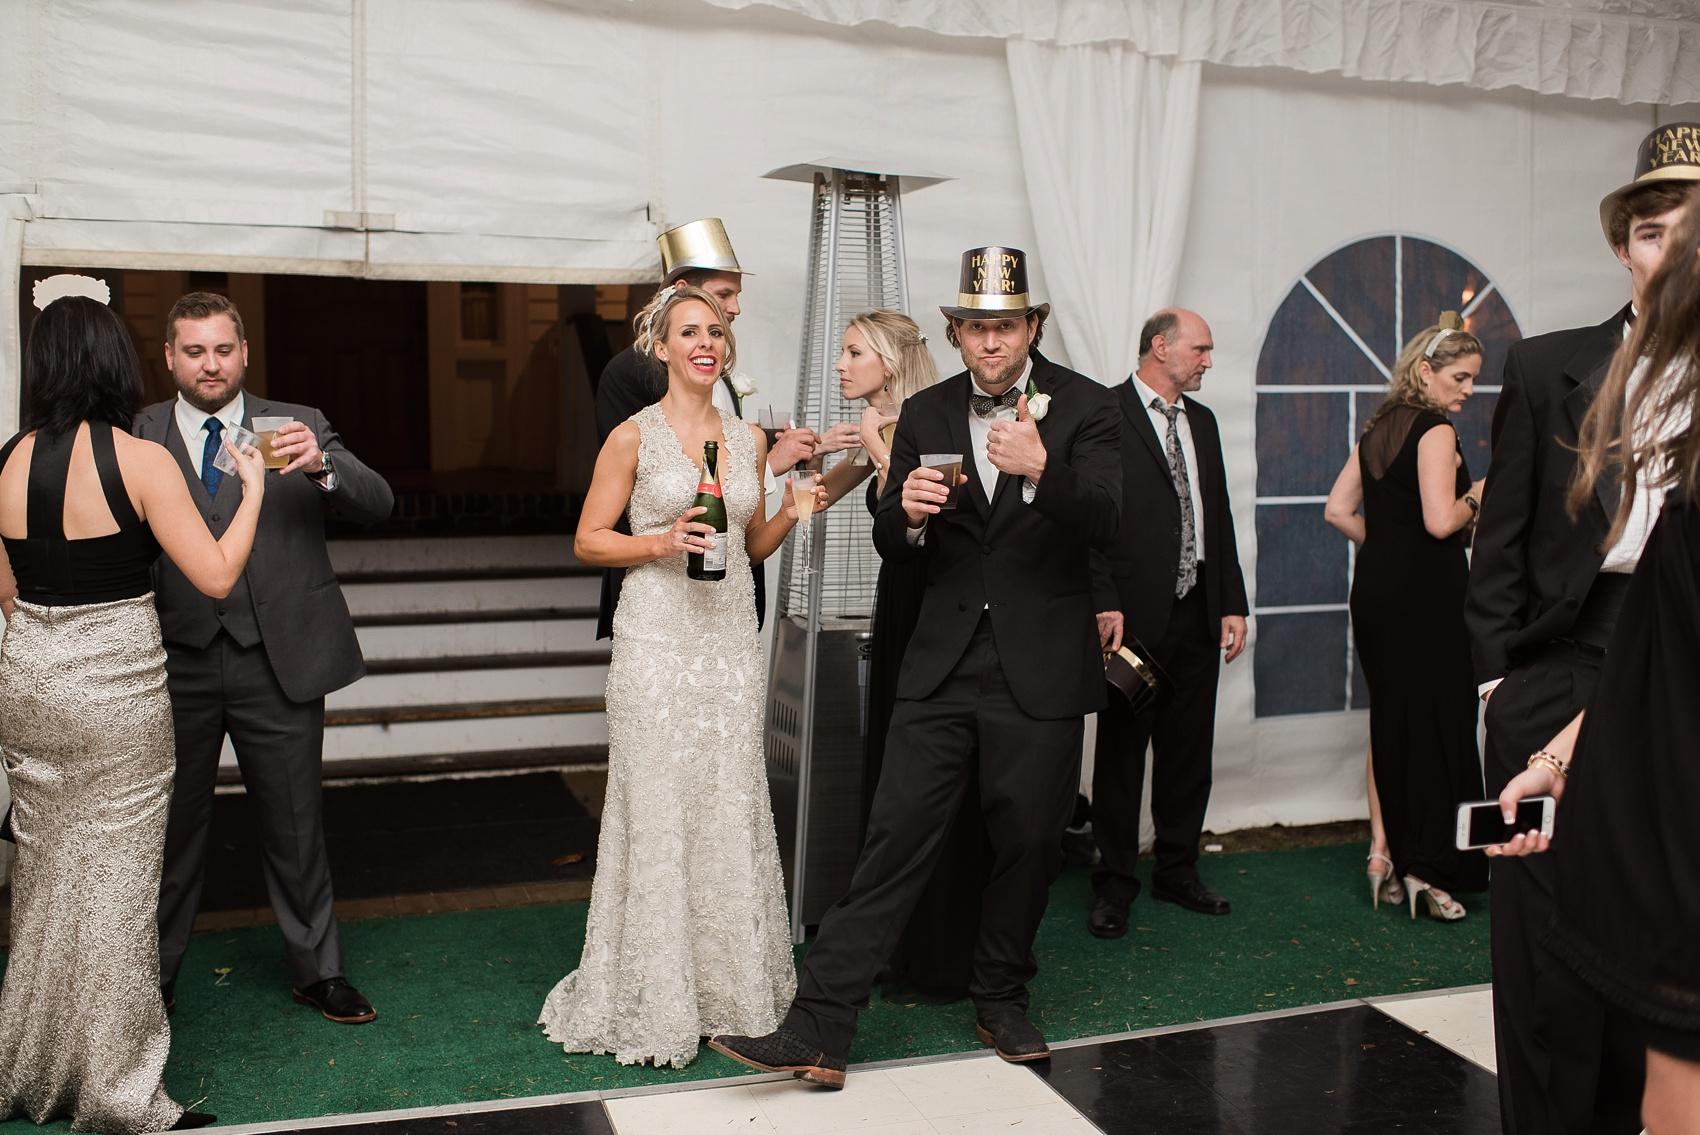 South_carolina_wedding_photographer_0120.jpg